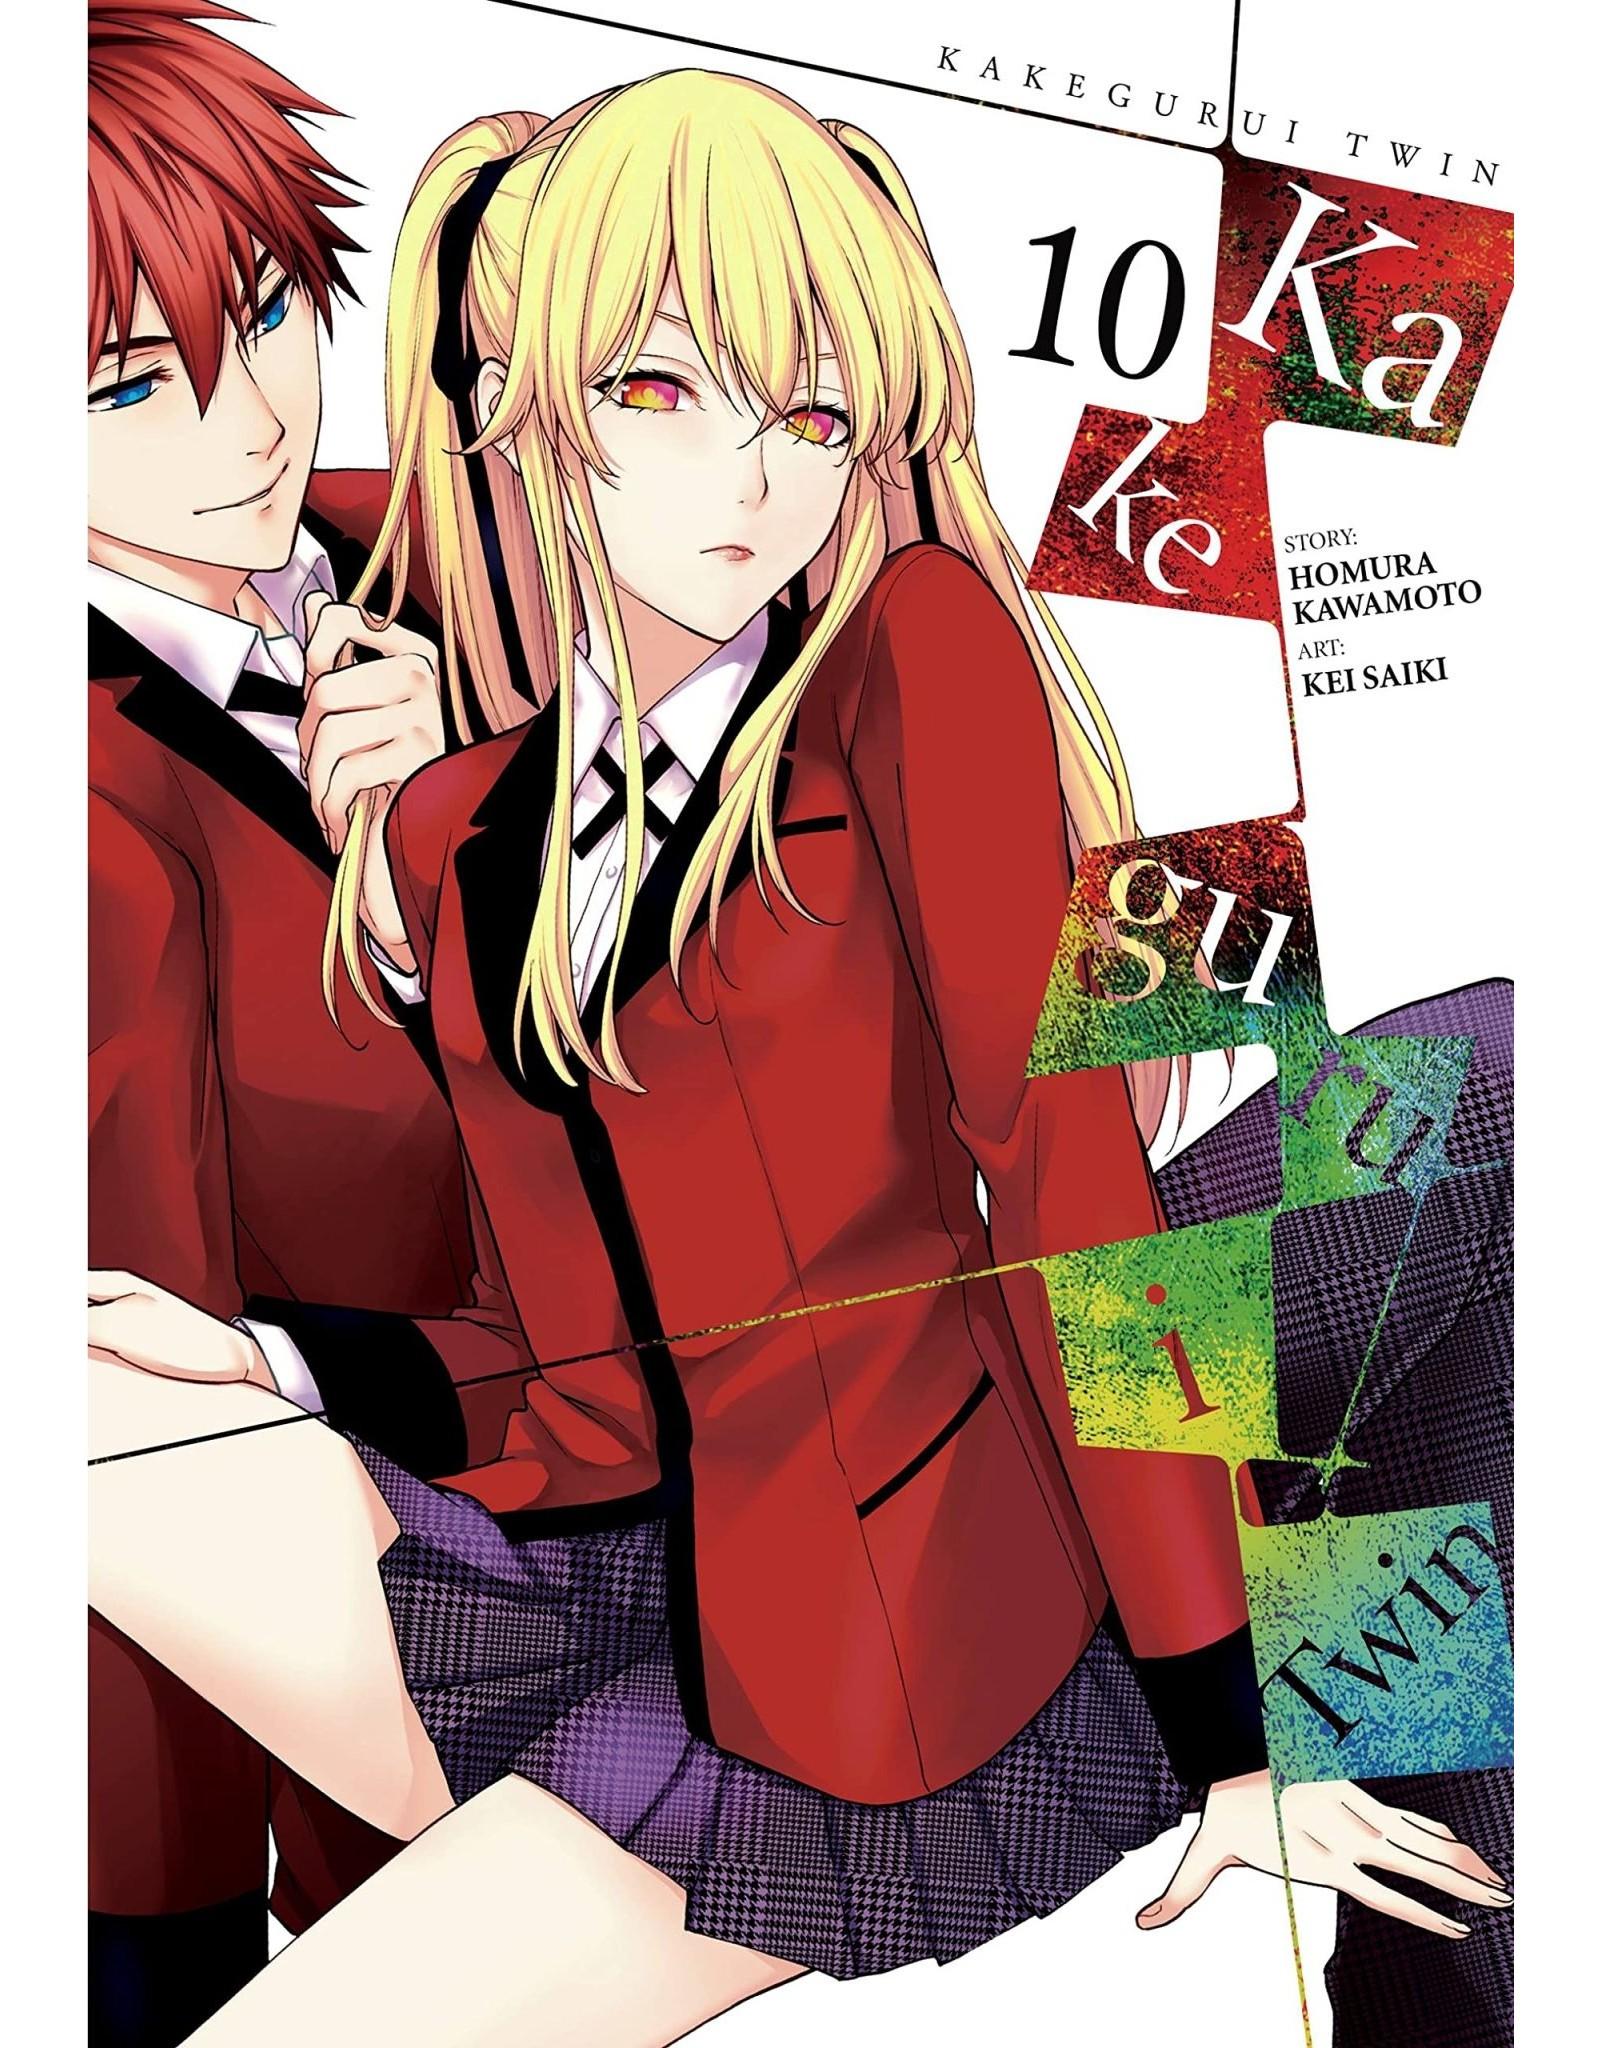 Kakegurui Twin 10 (English) - Manga